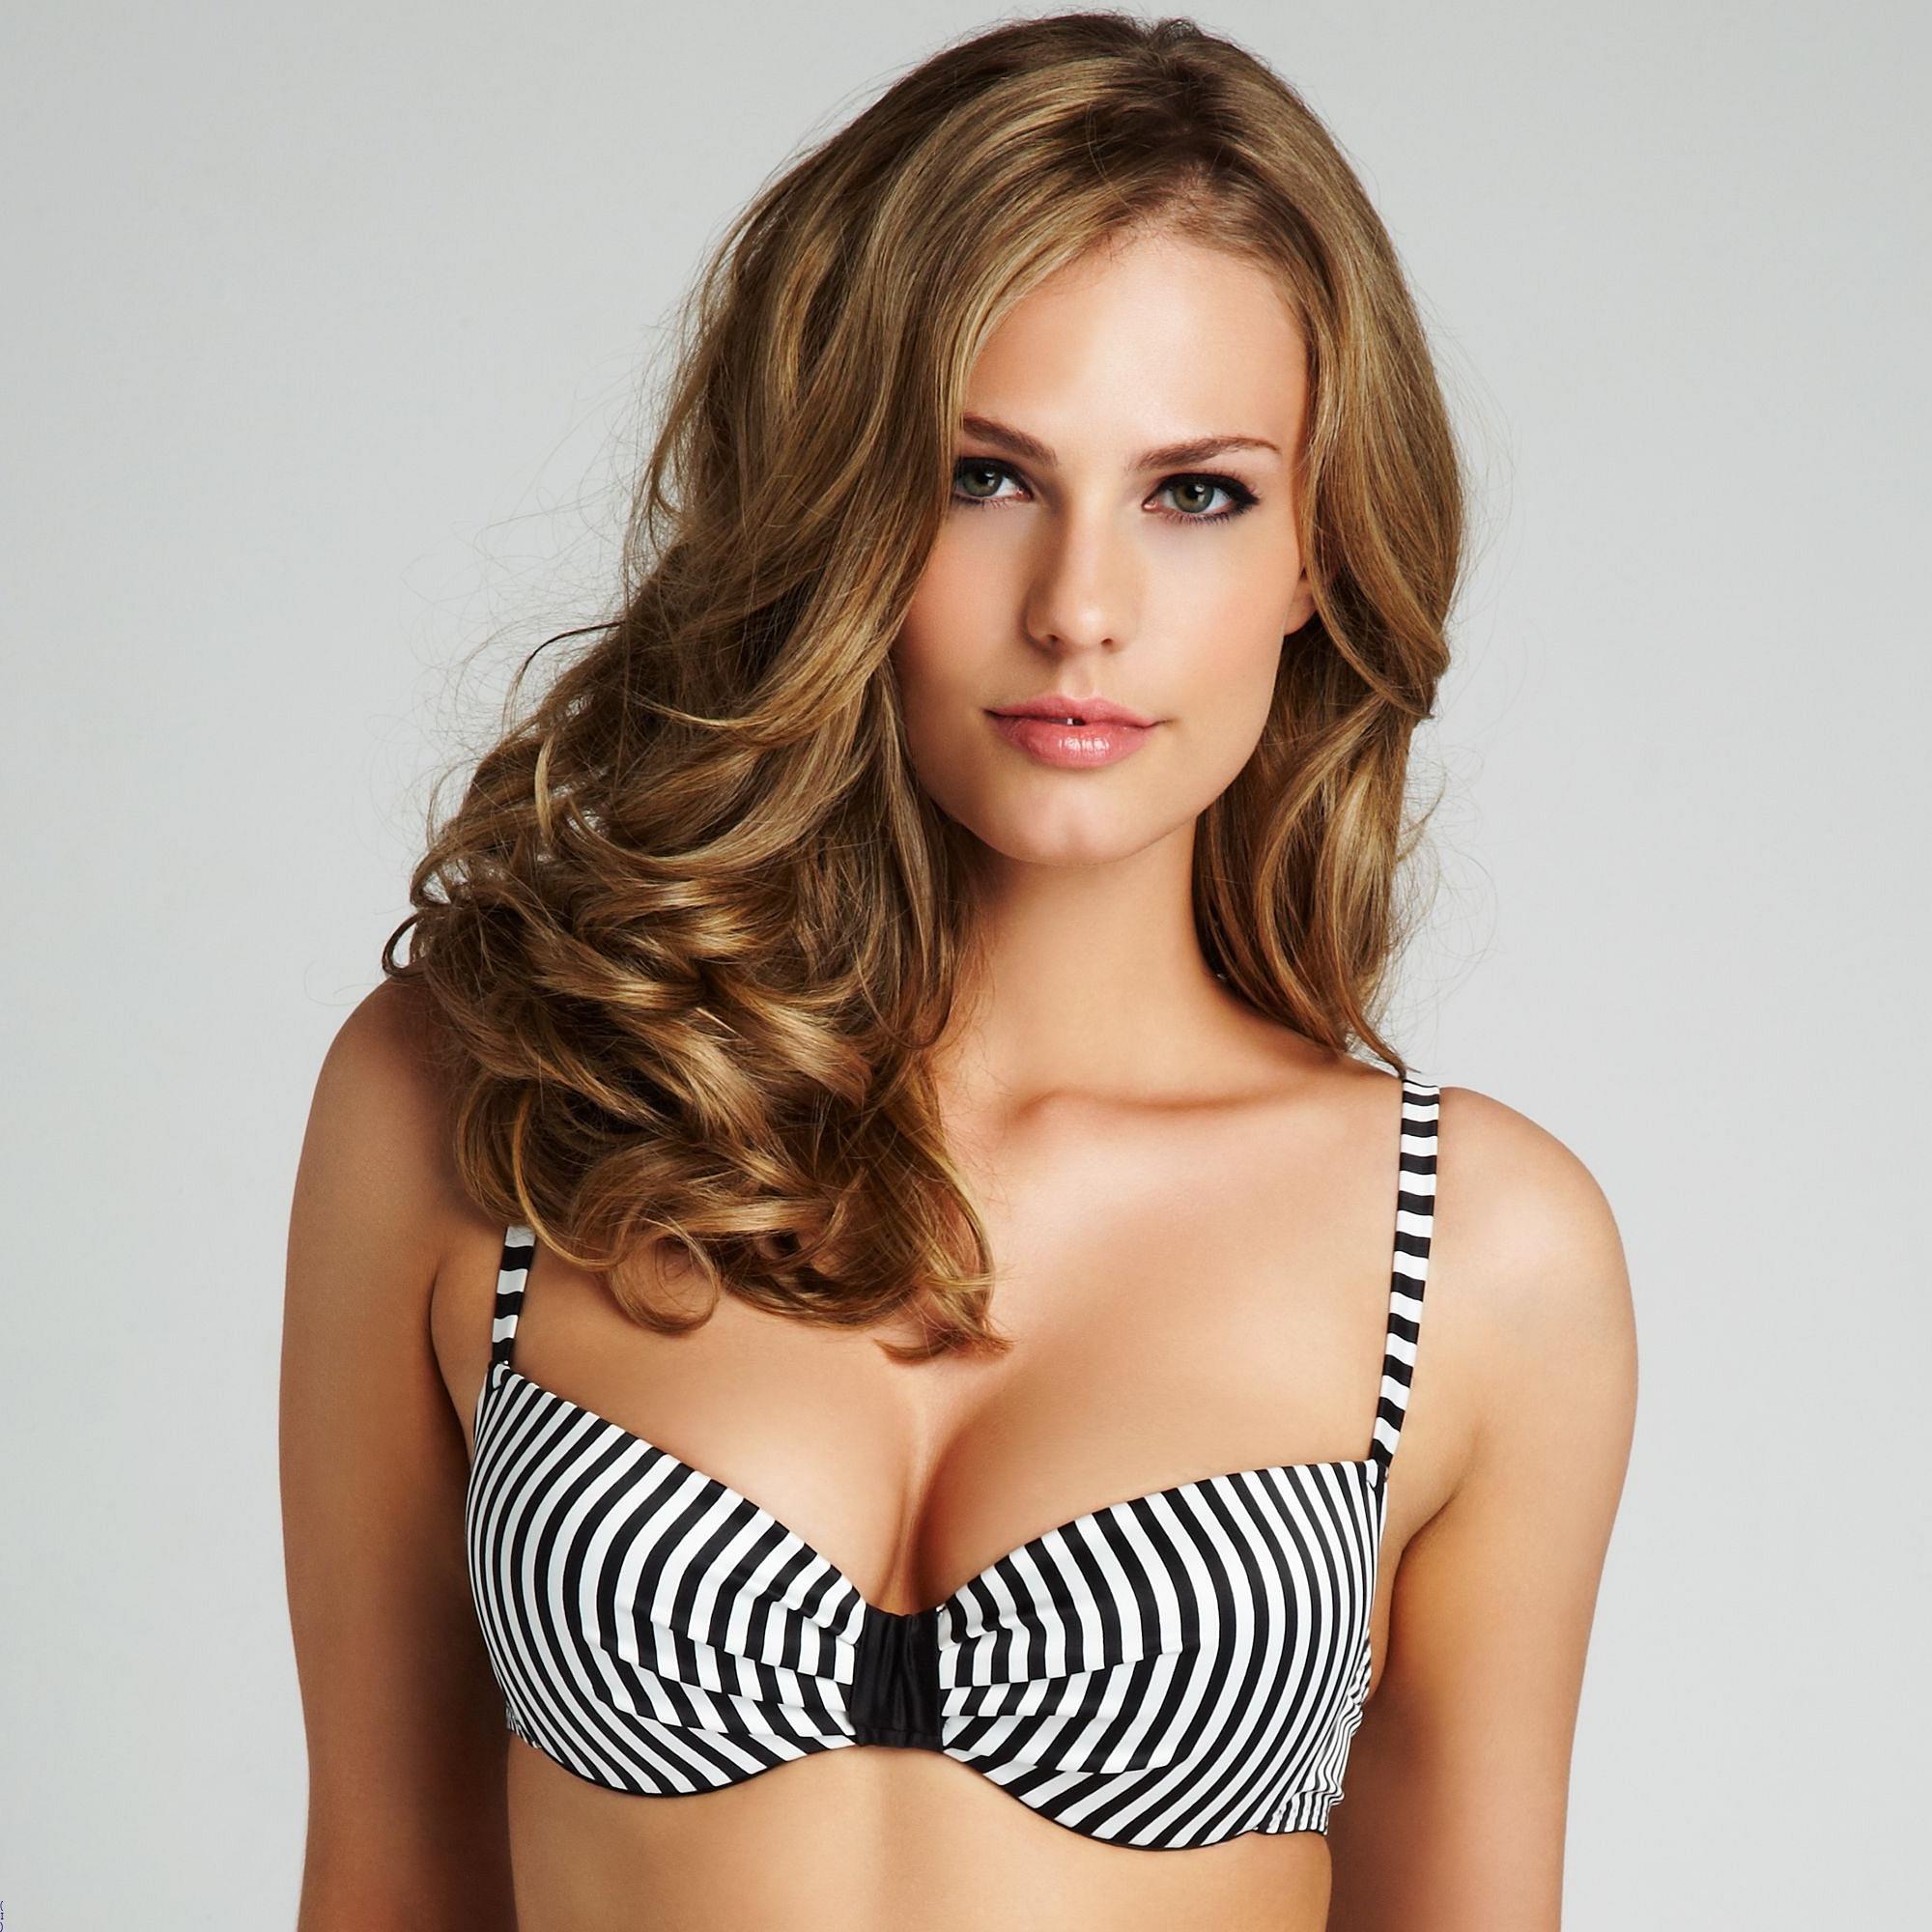 Aniko Michnyaova in lingerie